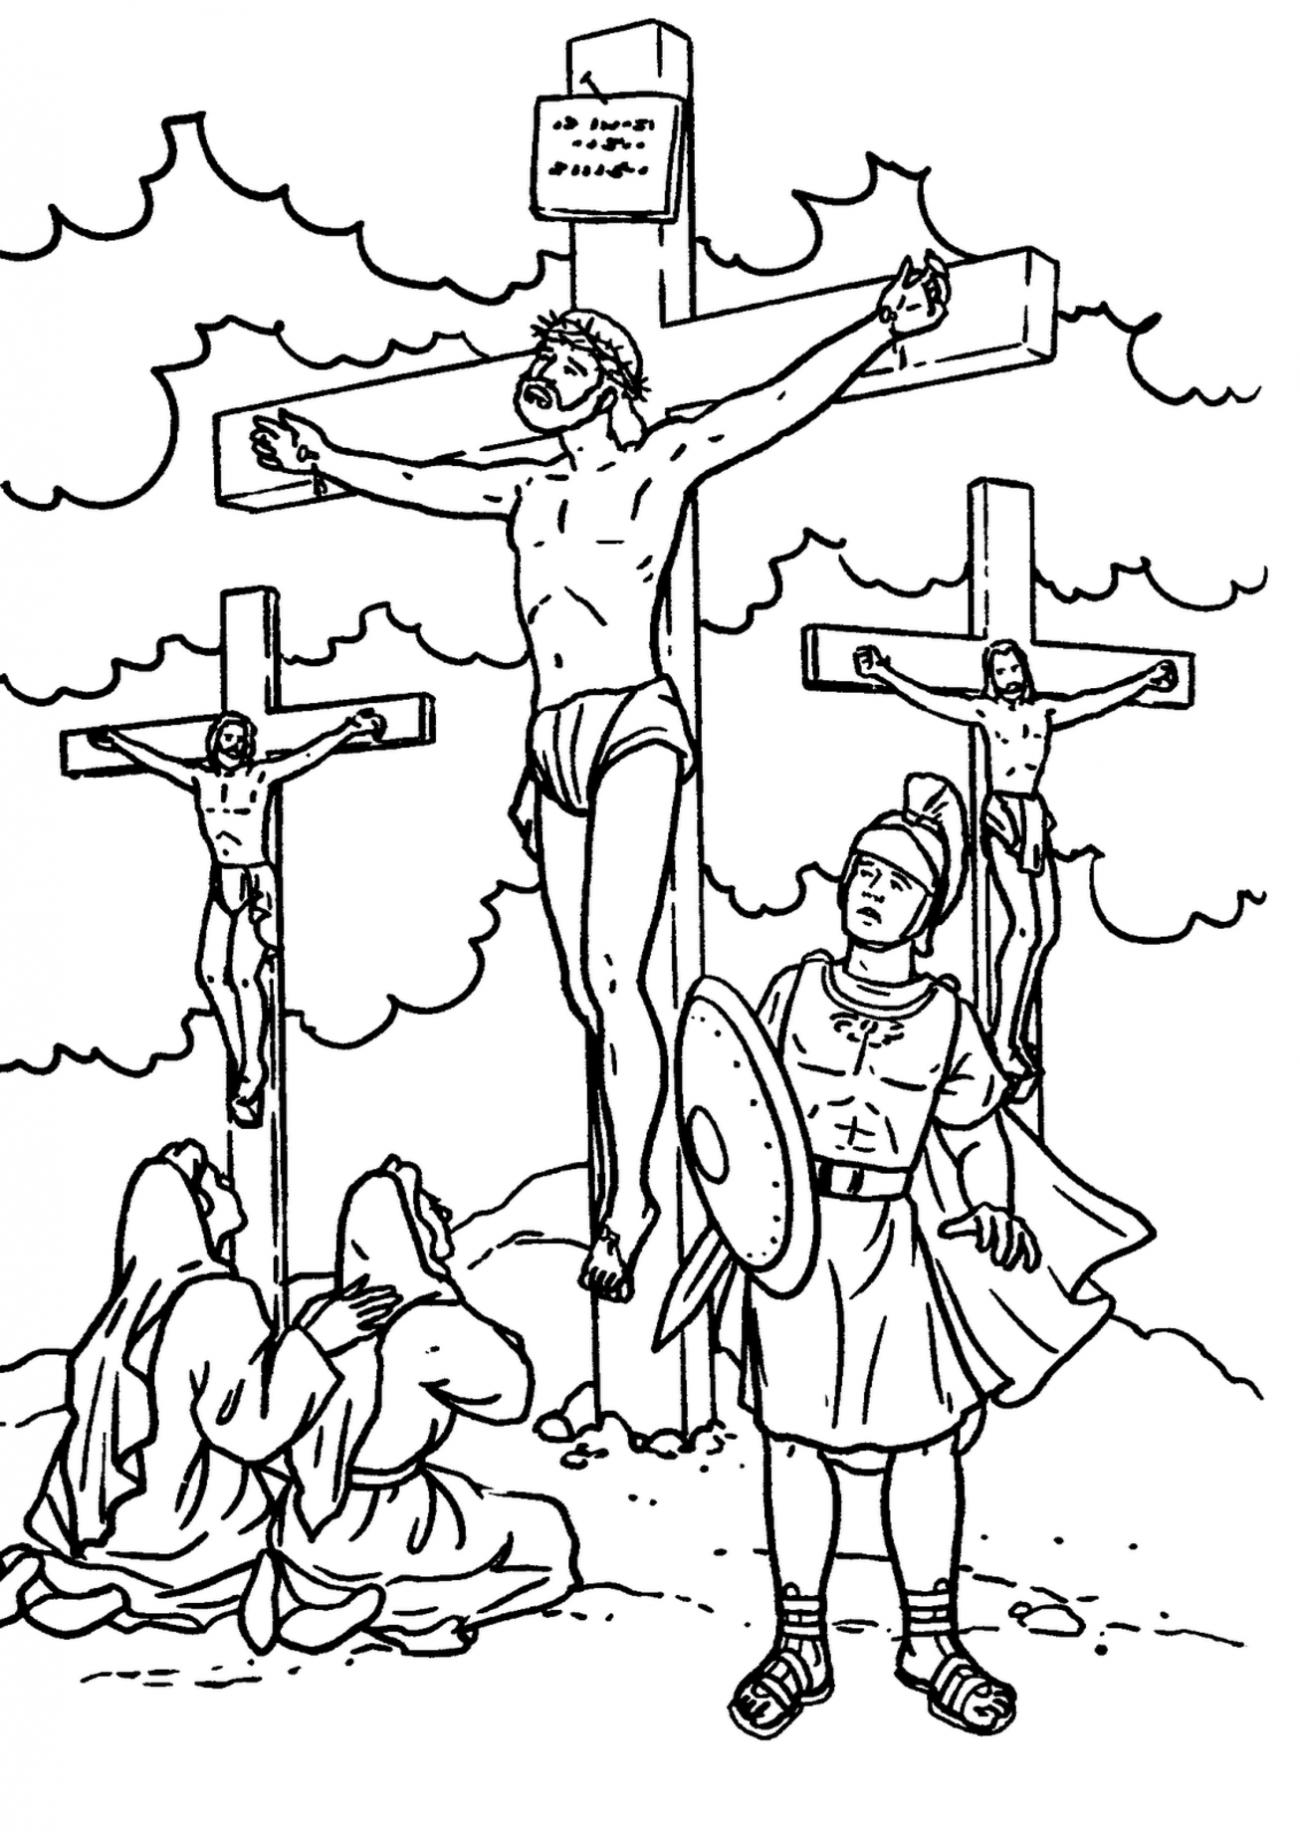 free coloring pages jesus jesus christ coloring pages getcoloringpagescom pages free jesus coloring